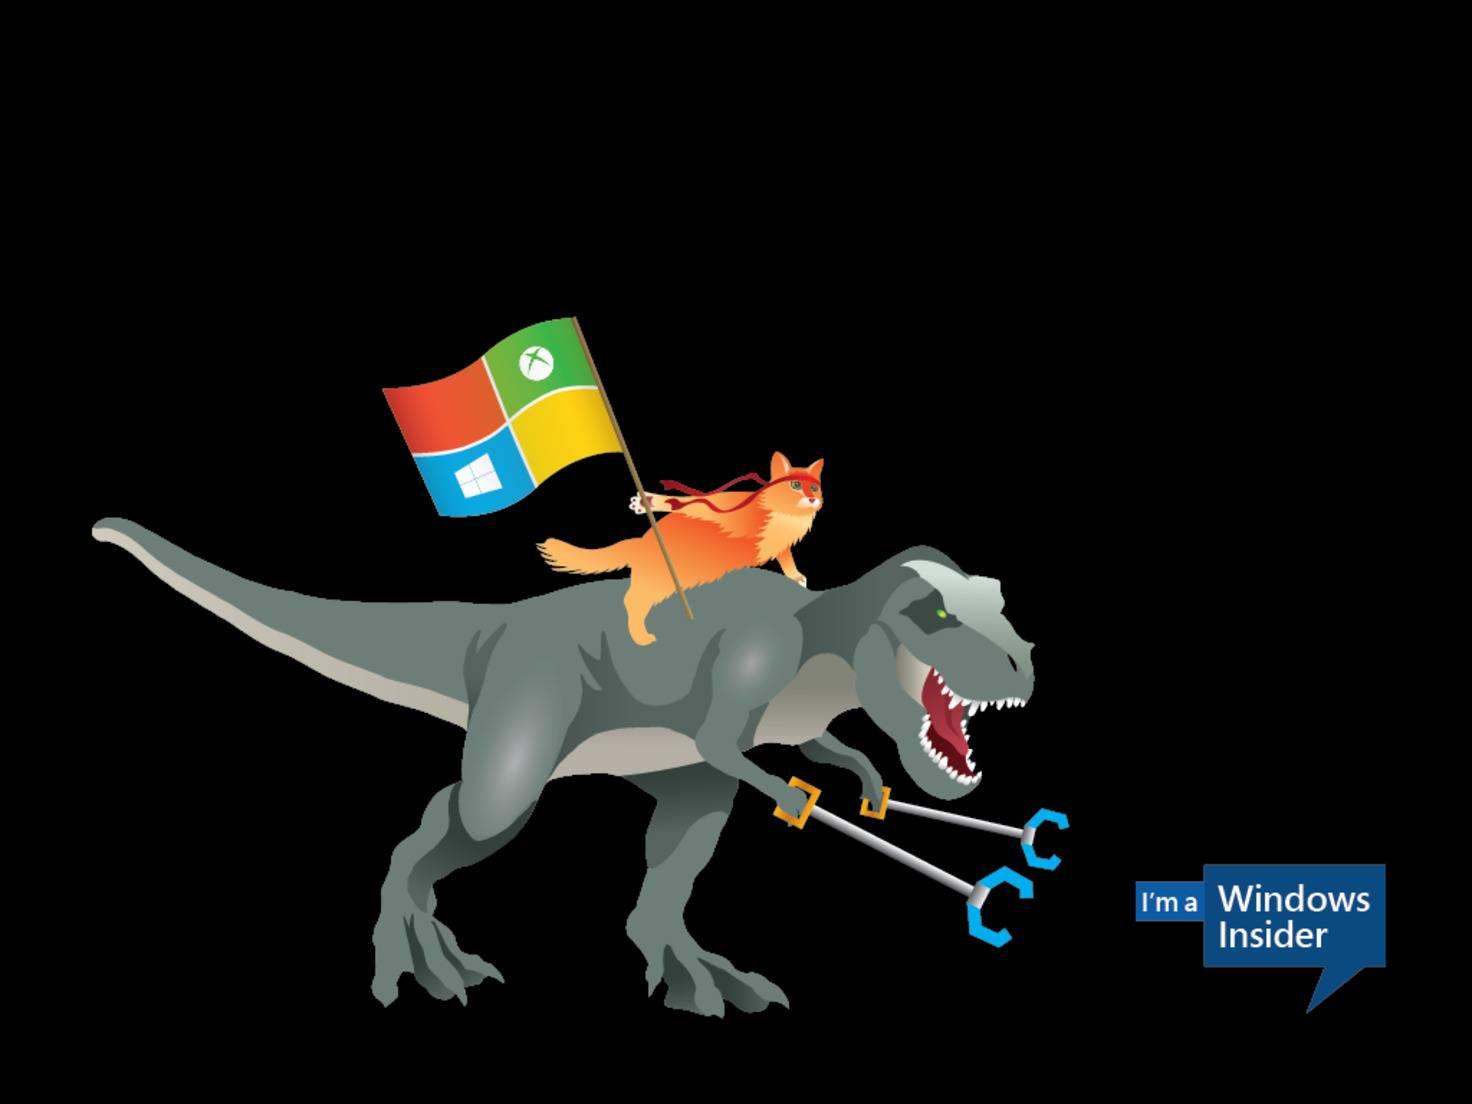 Windows_Insider_Ninjacat_Trex-1024x768